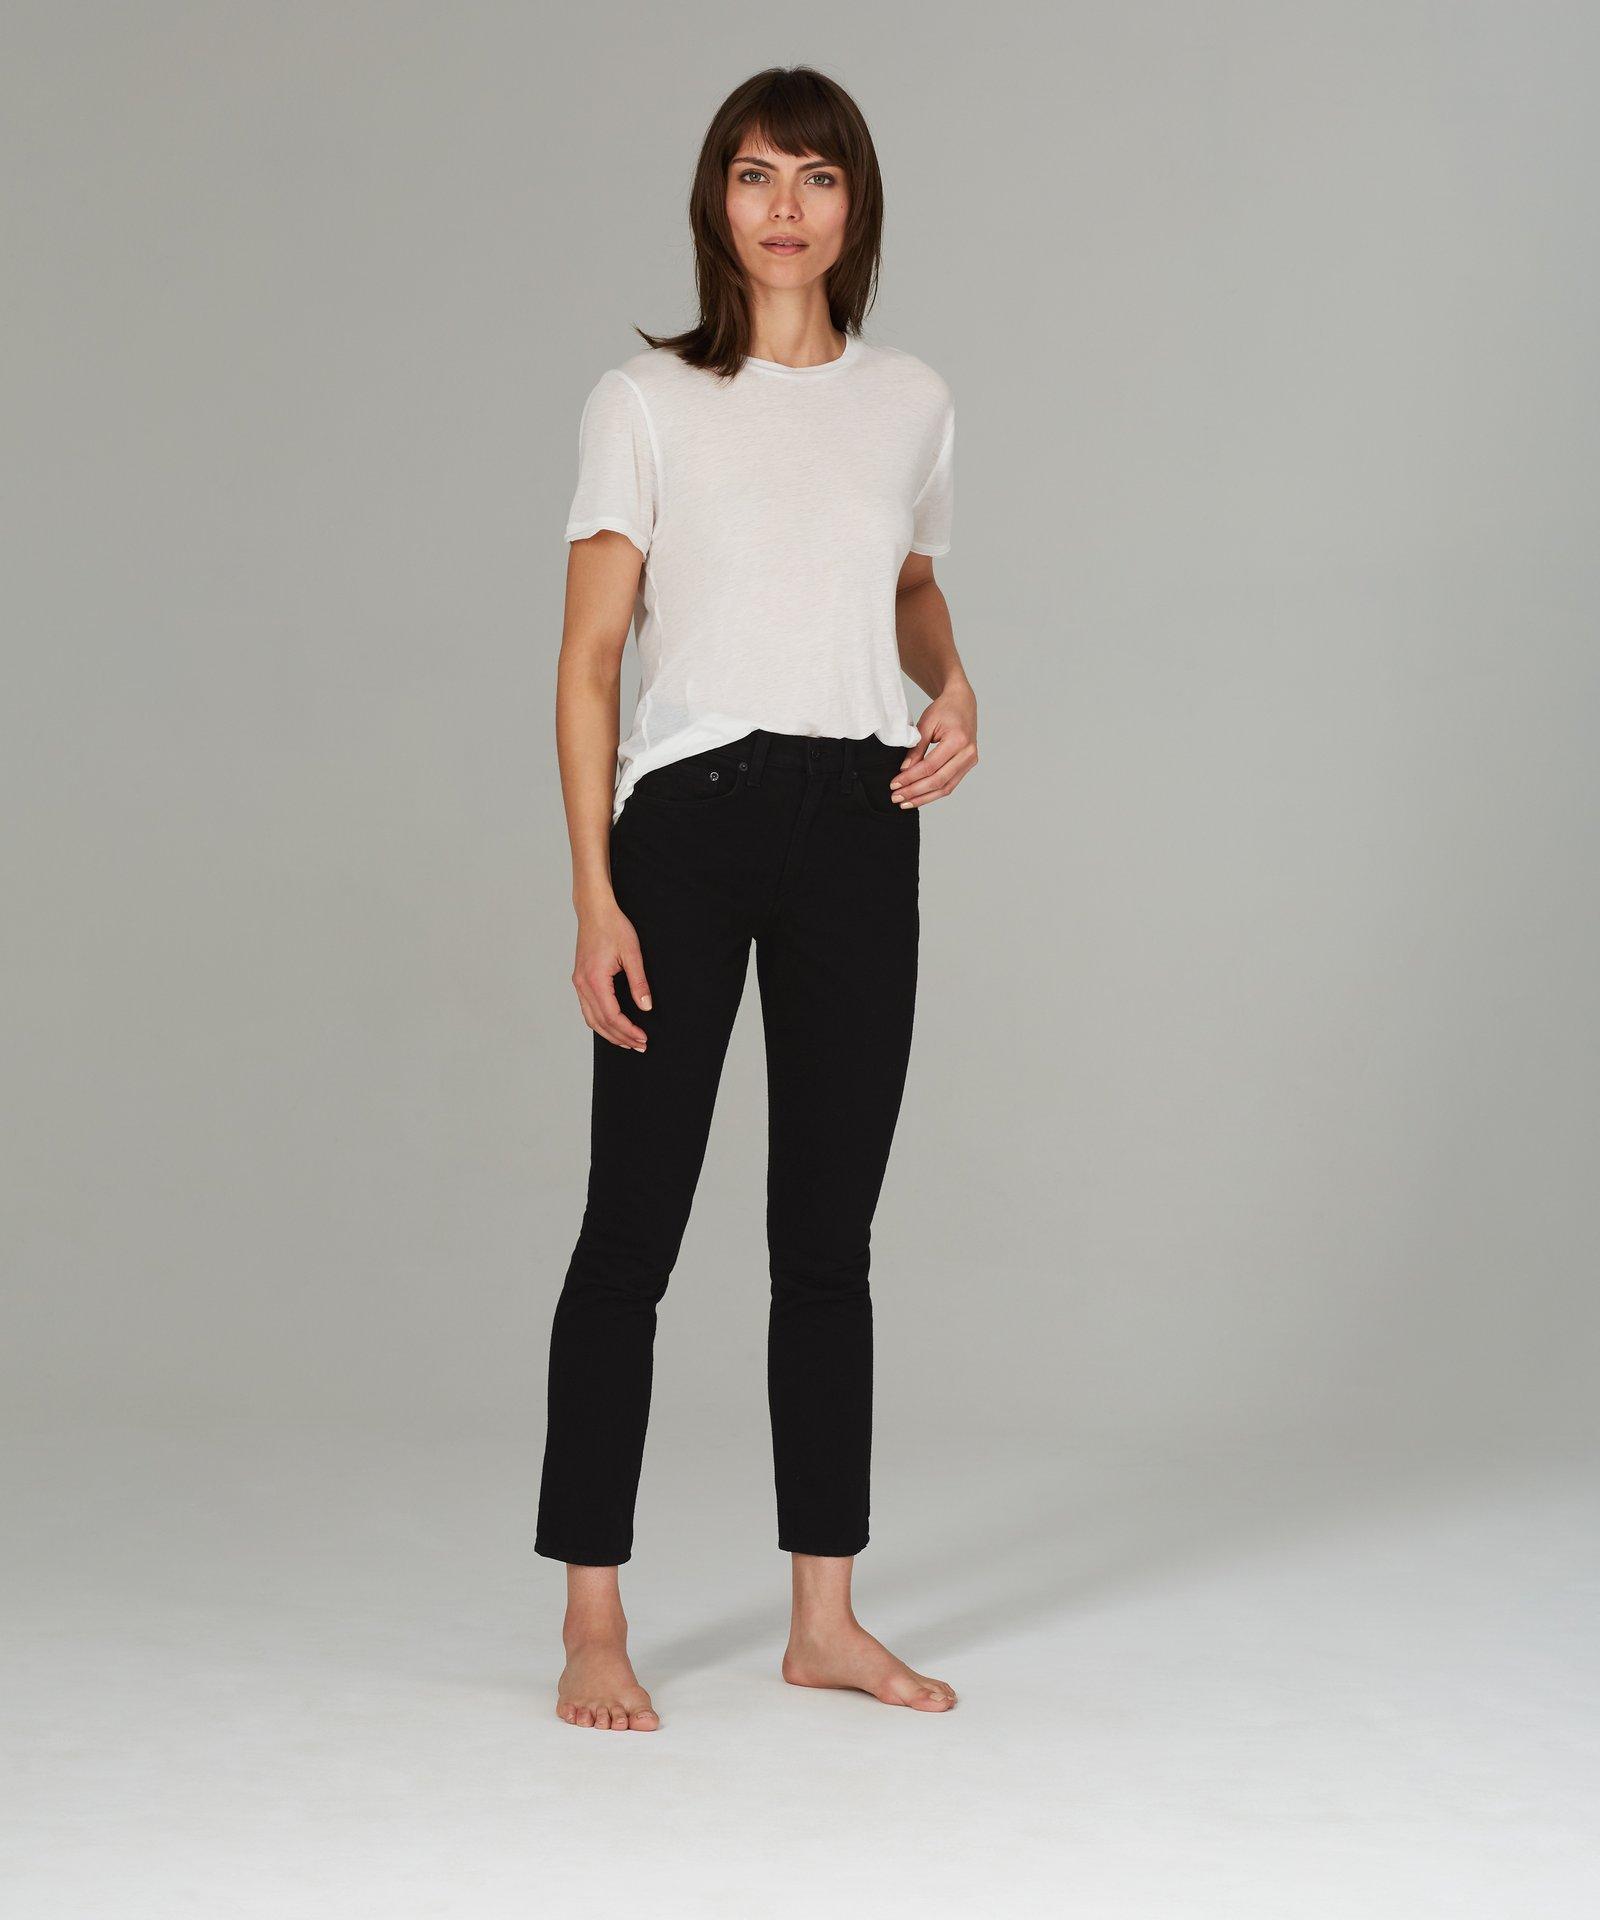 cropped jeans, skinny jeans, denim, black denim, high rise, askk ny